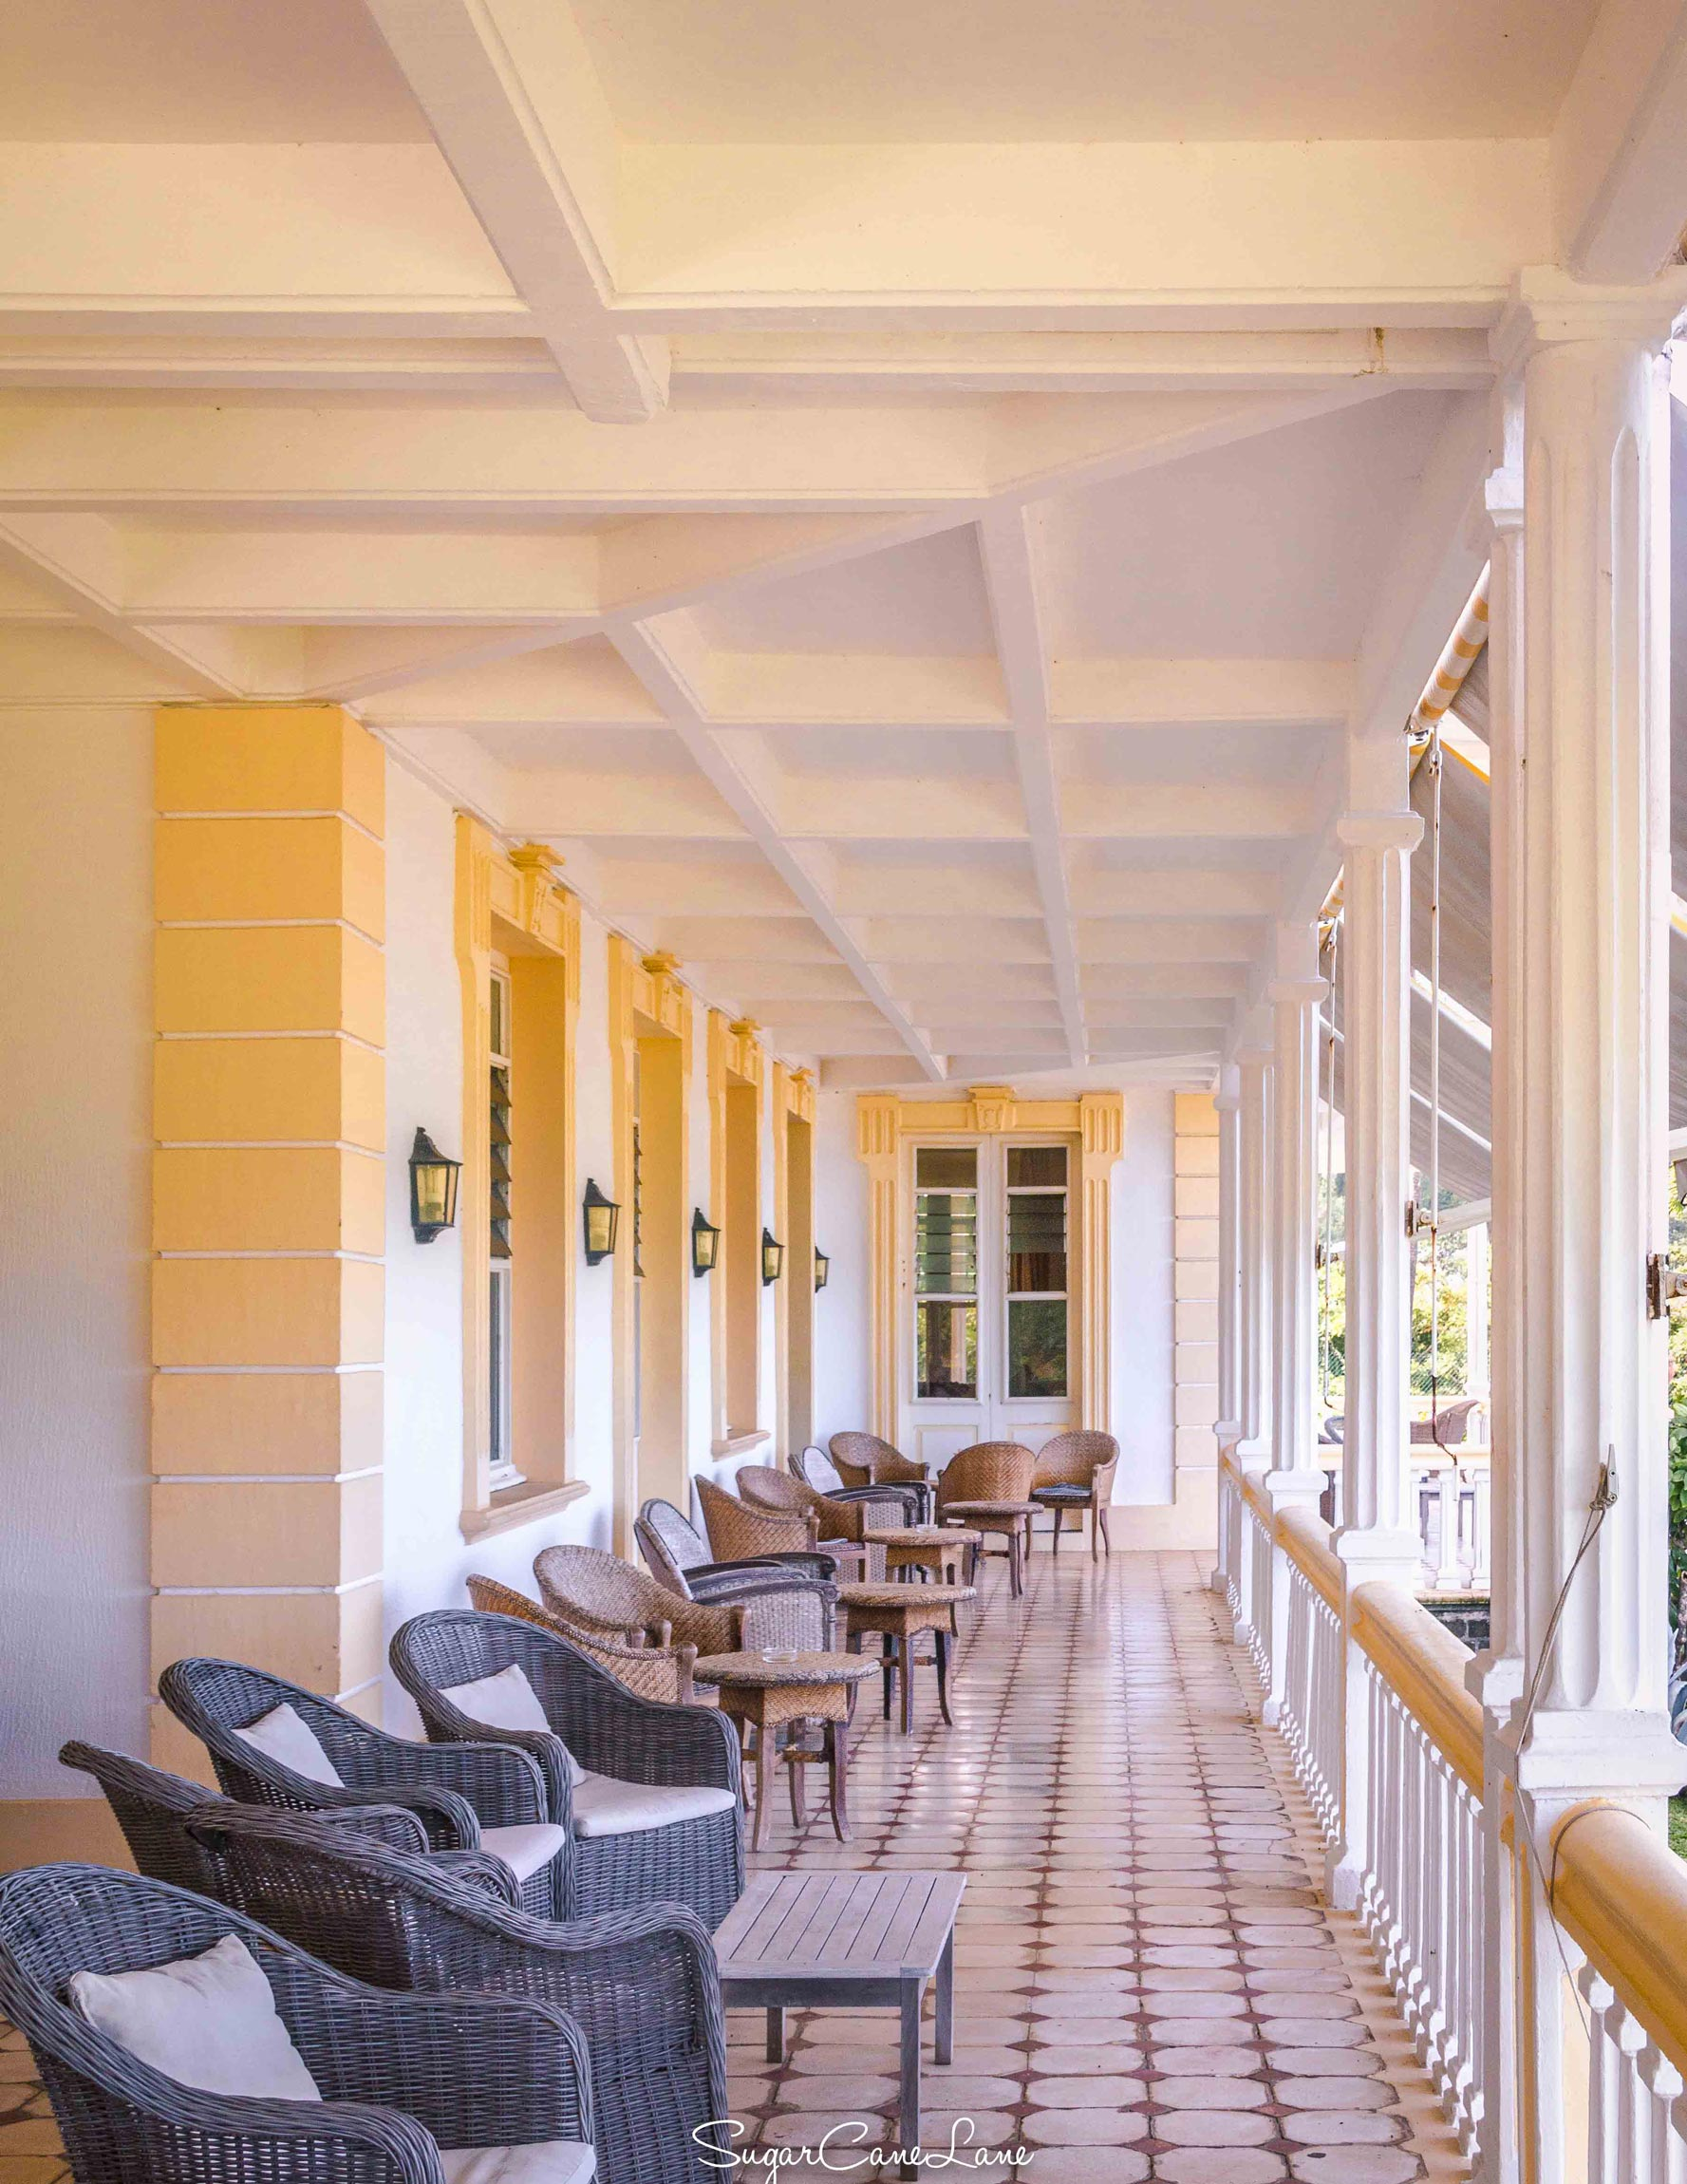 martinique, domaine saint-aubin : veranda et fauteuils de jardin